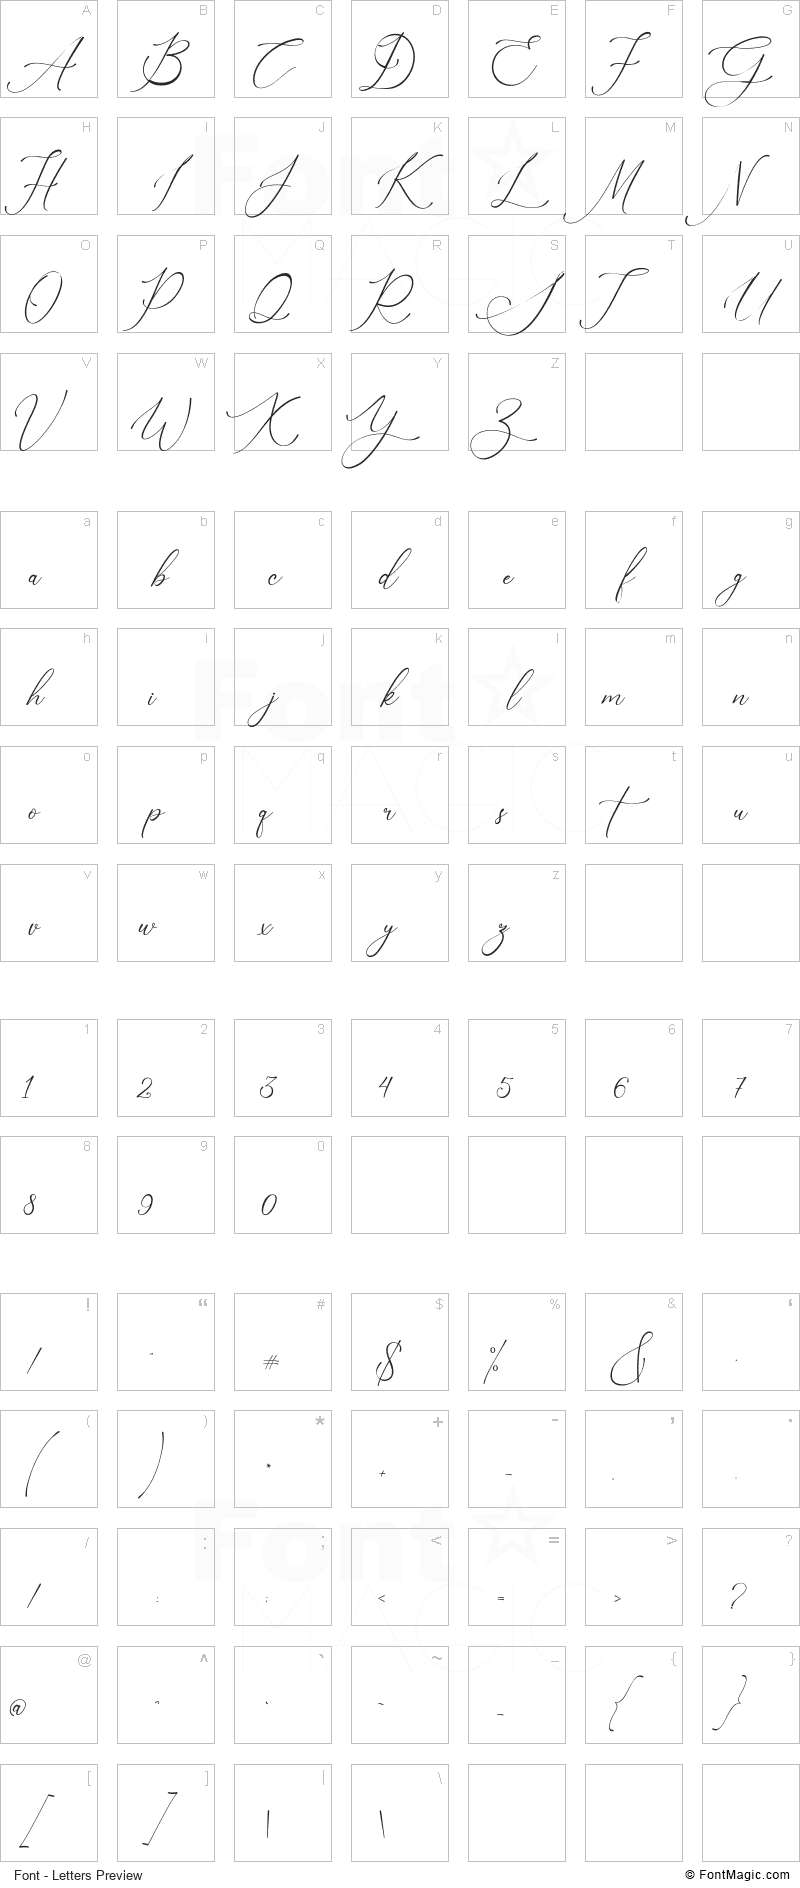 Nagisha Font - All Latters Preview Chart